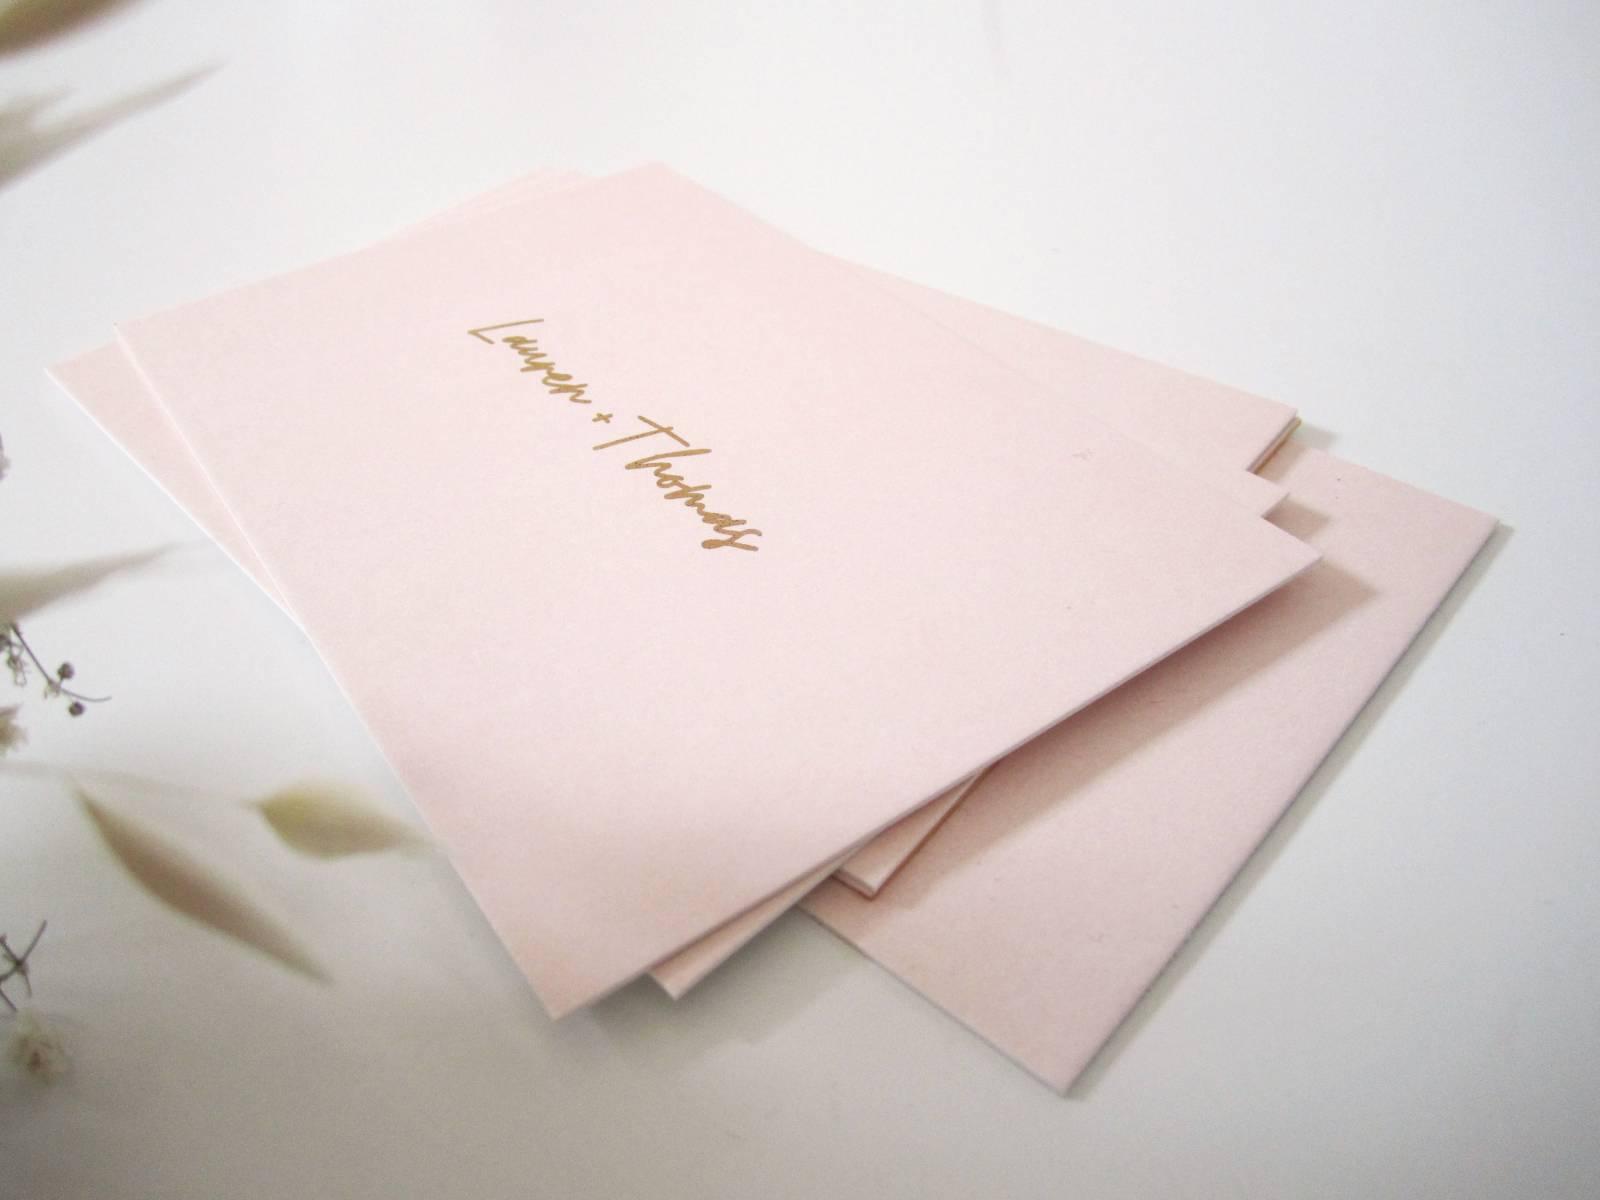 PlanMien - Trouwuitnodigingen en drukwerk - House of Weddings (8)